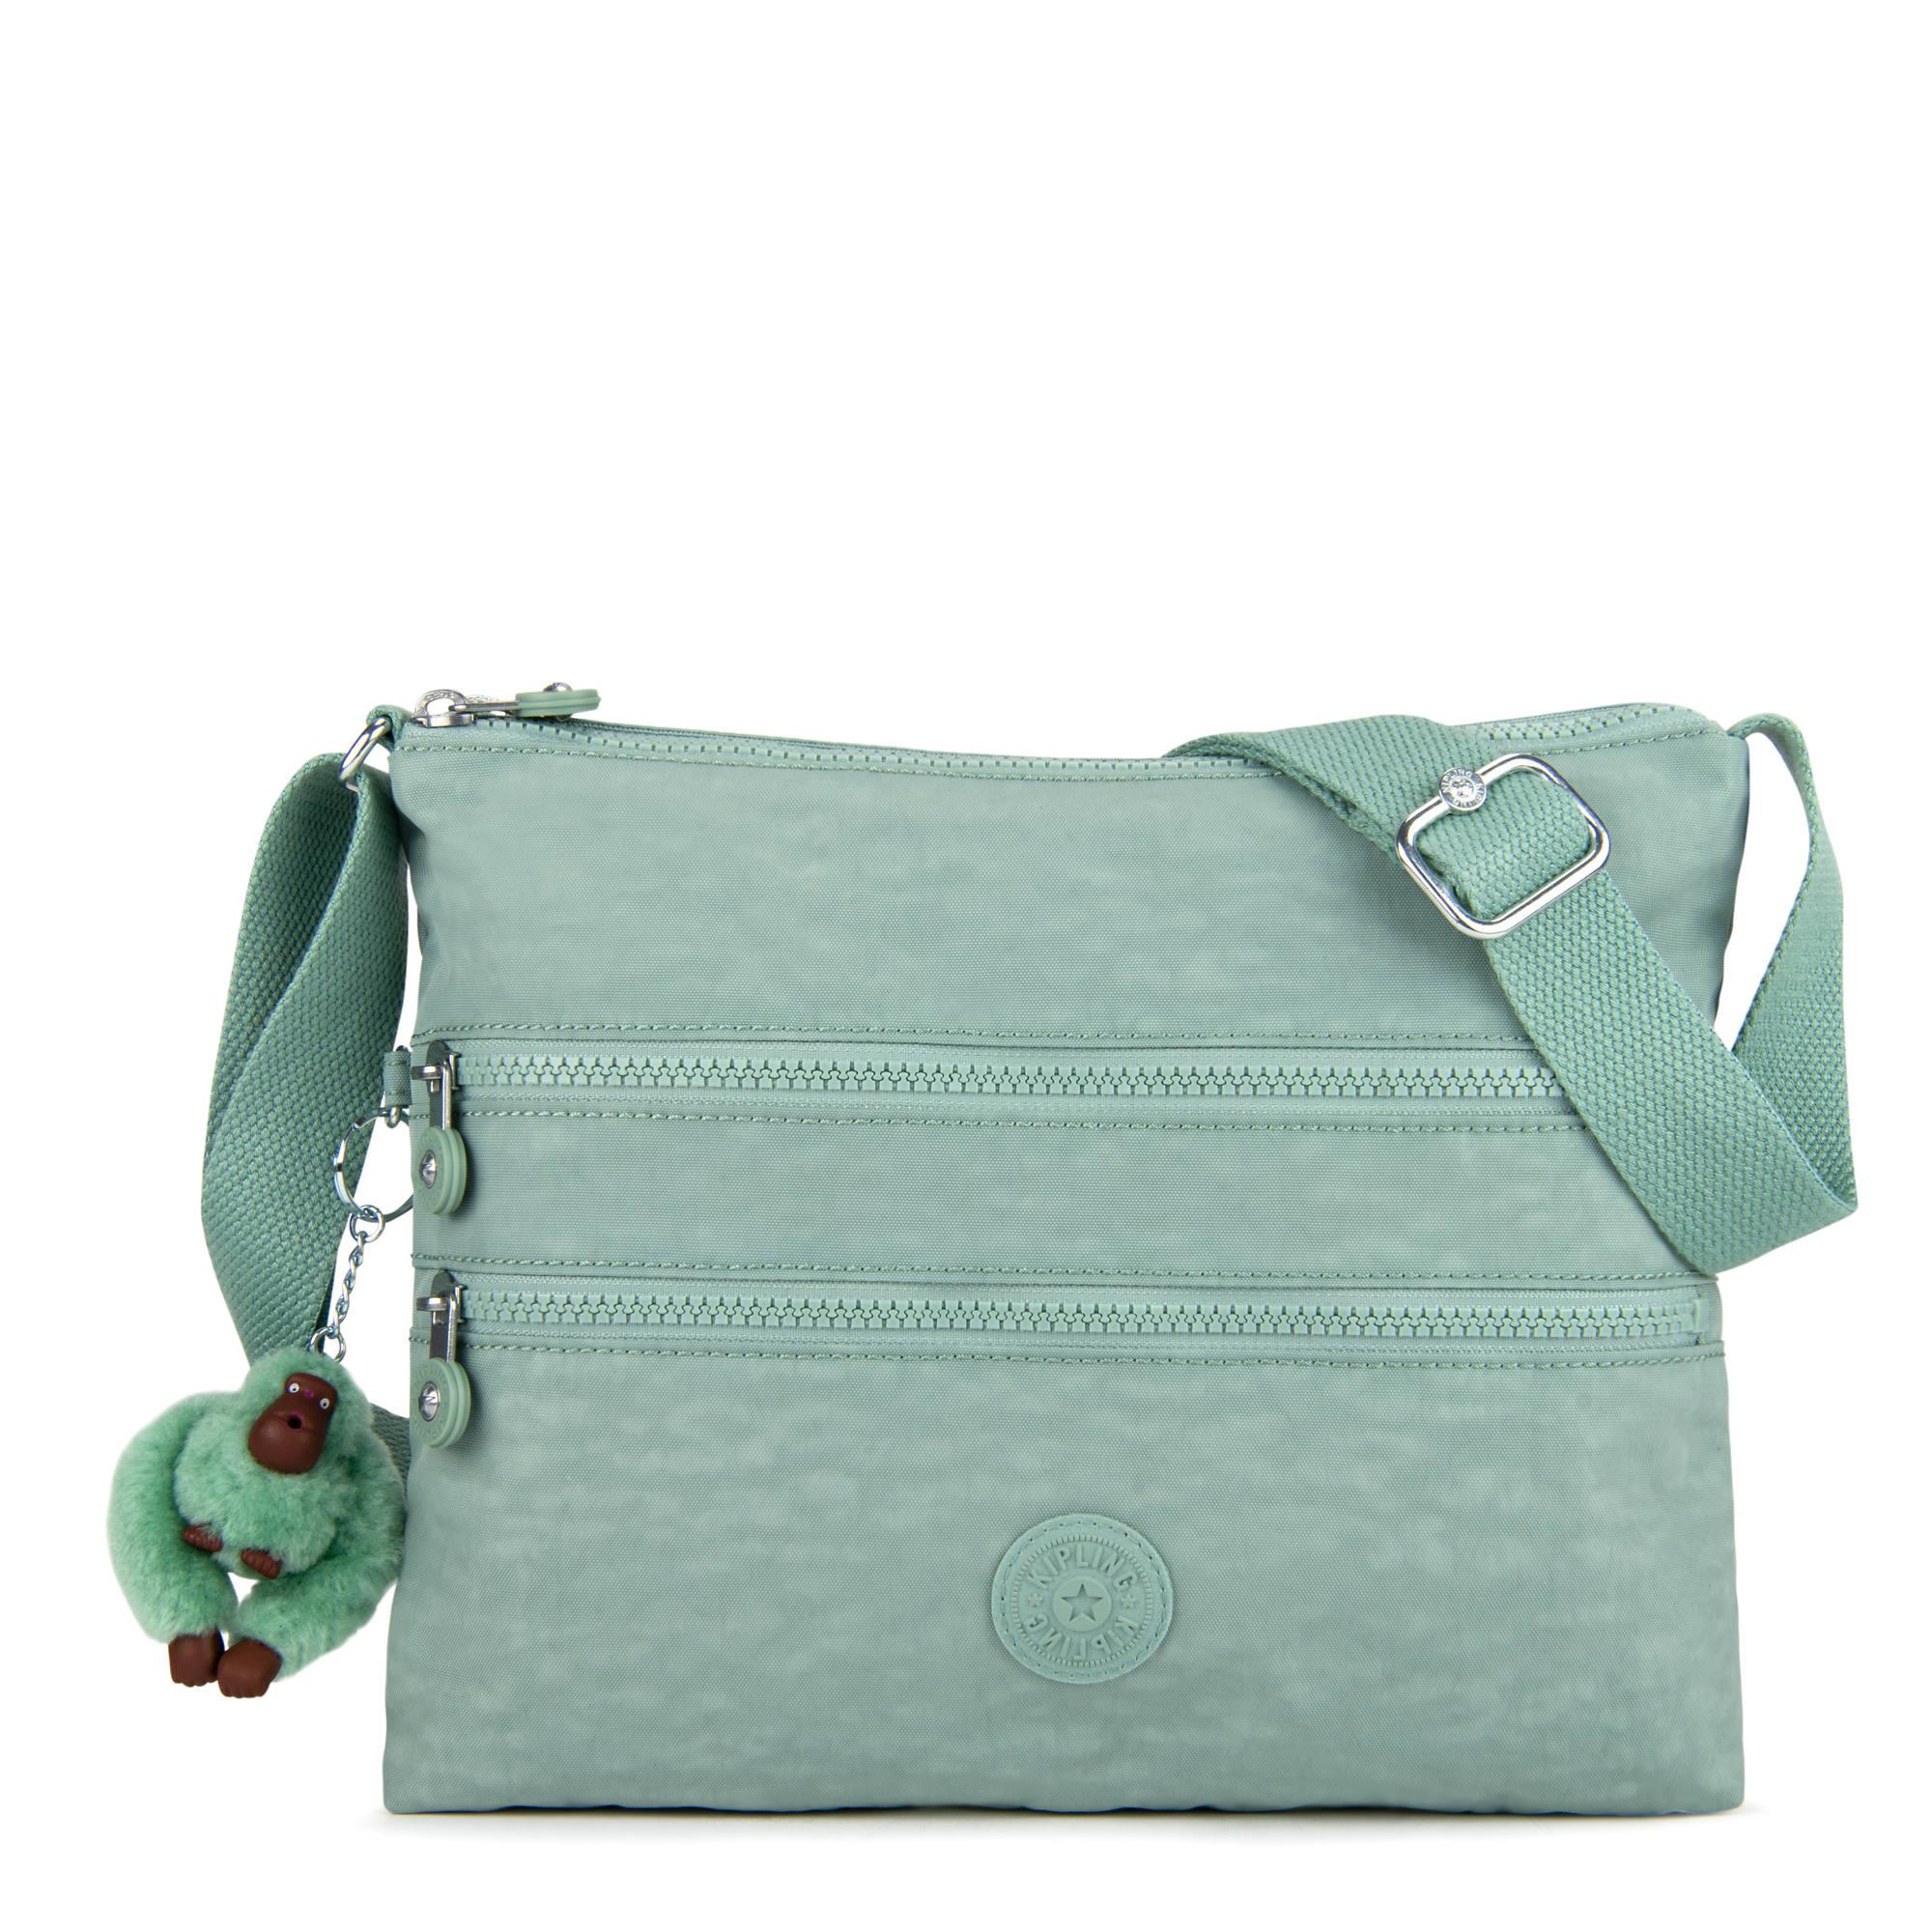 61c835fb1930 Alvar Crossbody Bag